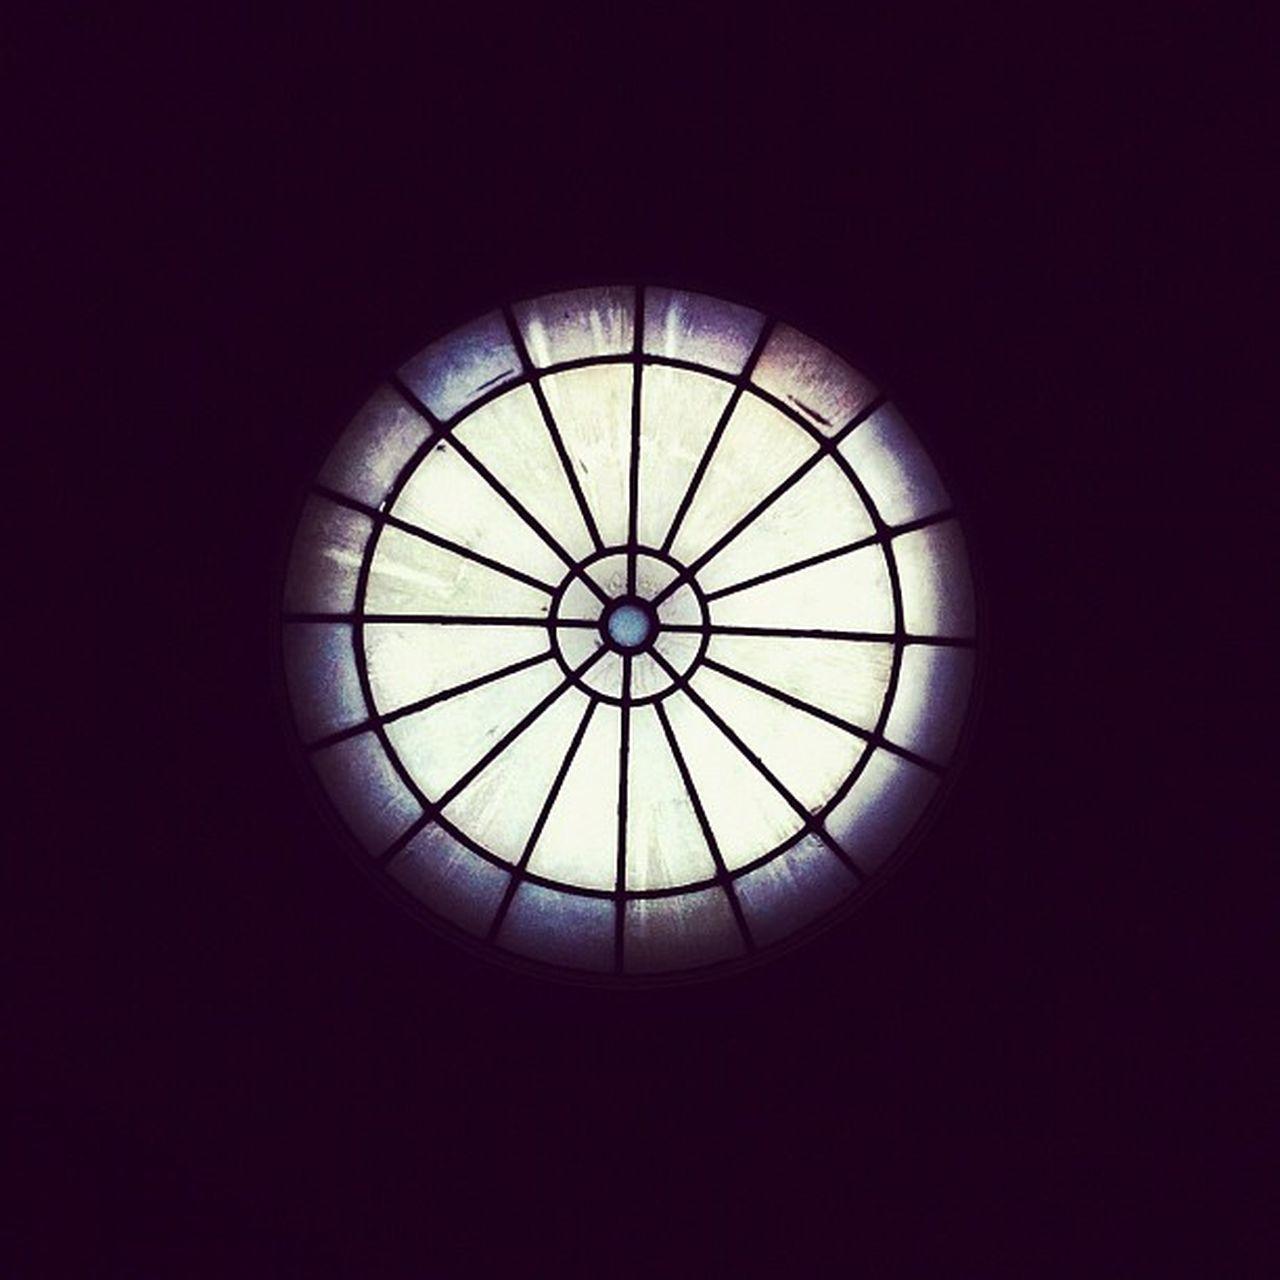 circle, indoors, no people, studio shot, dome, illuminated, cupola, architecture, black background, day